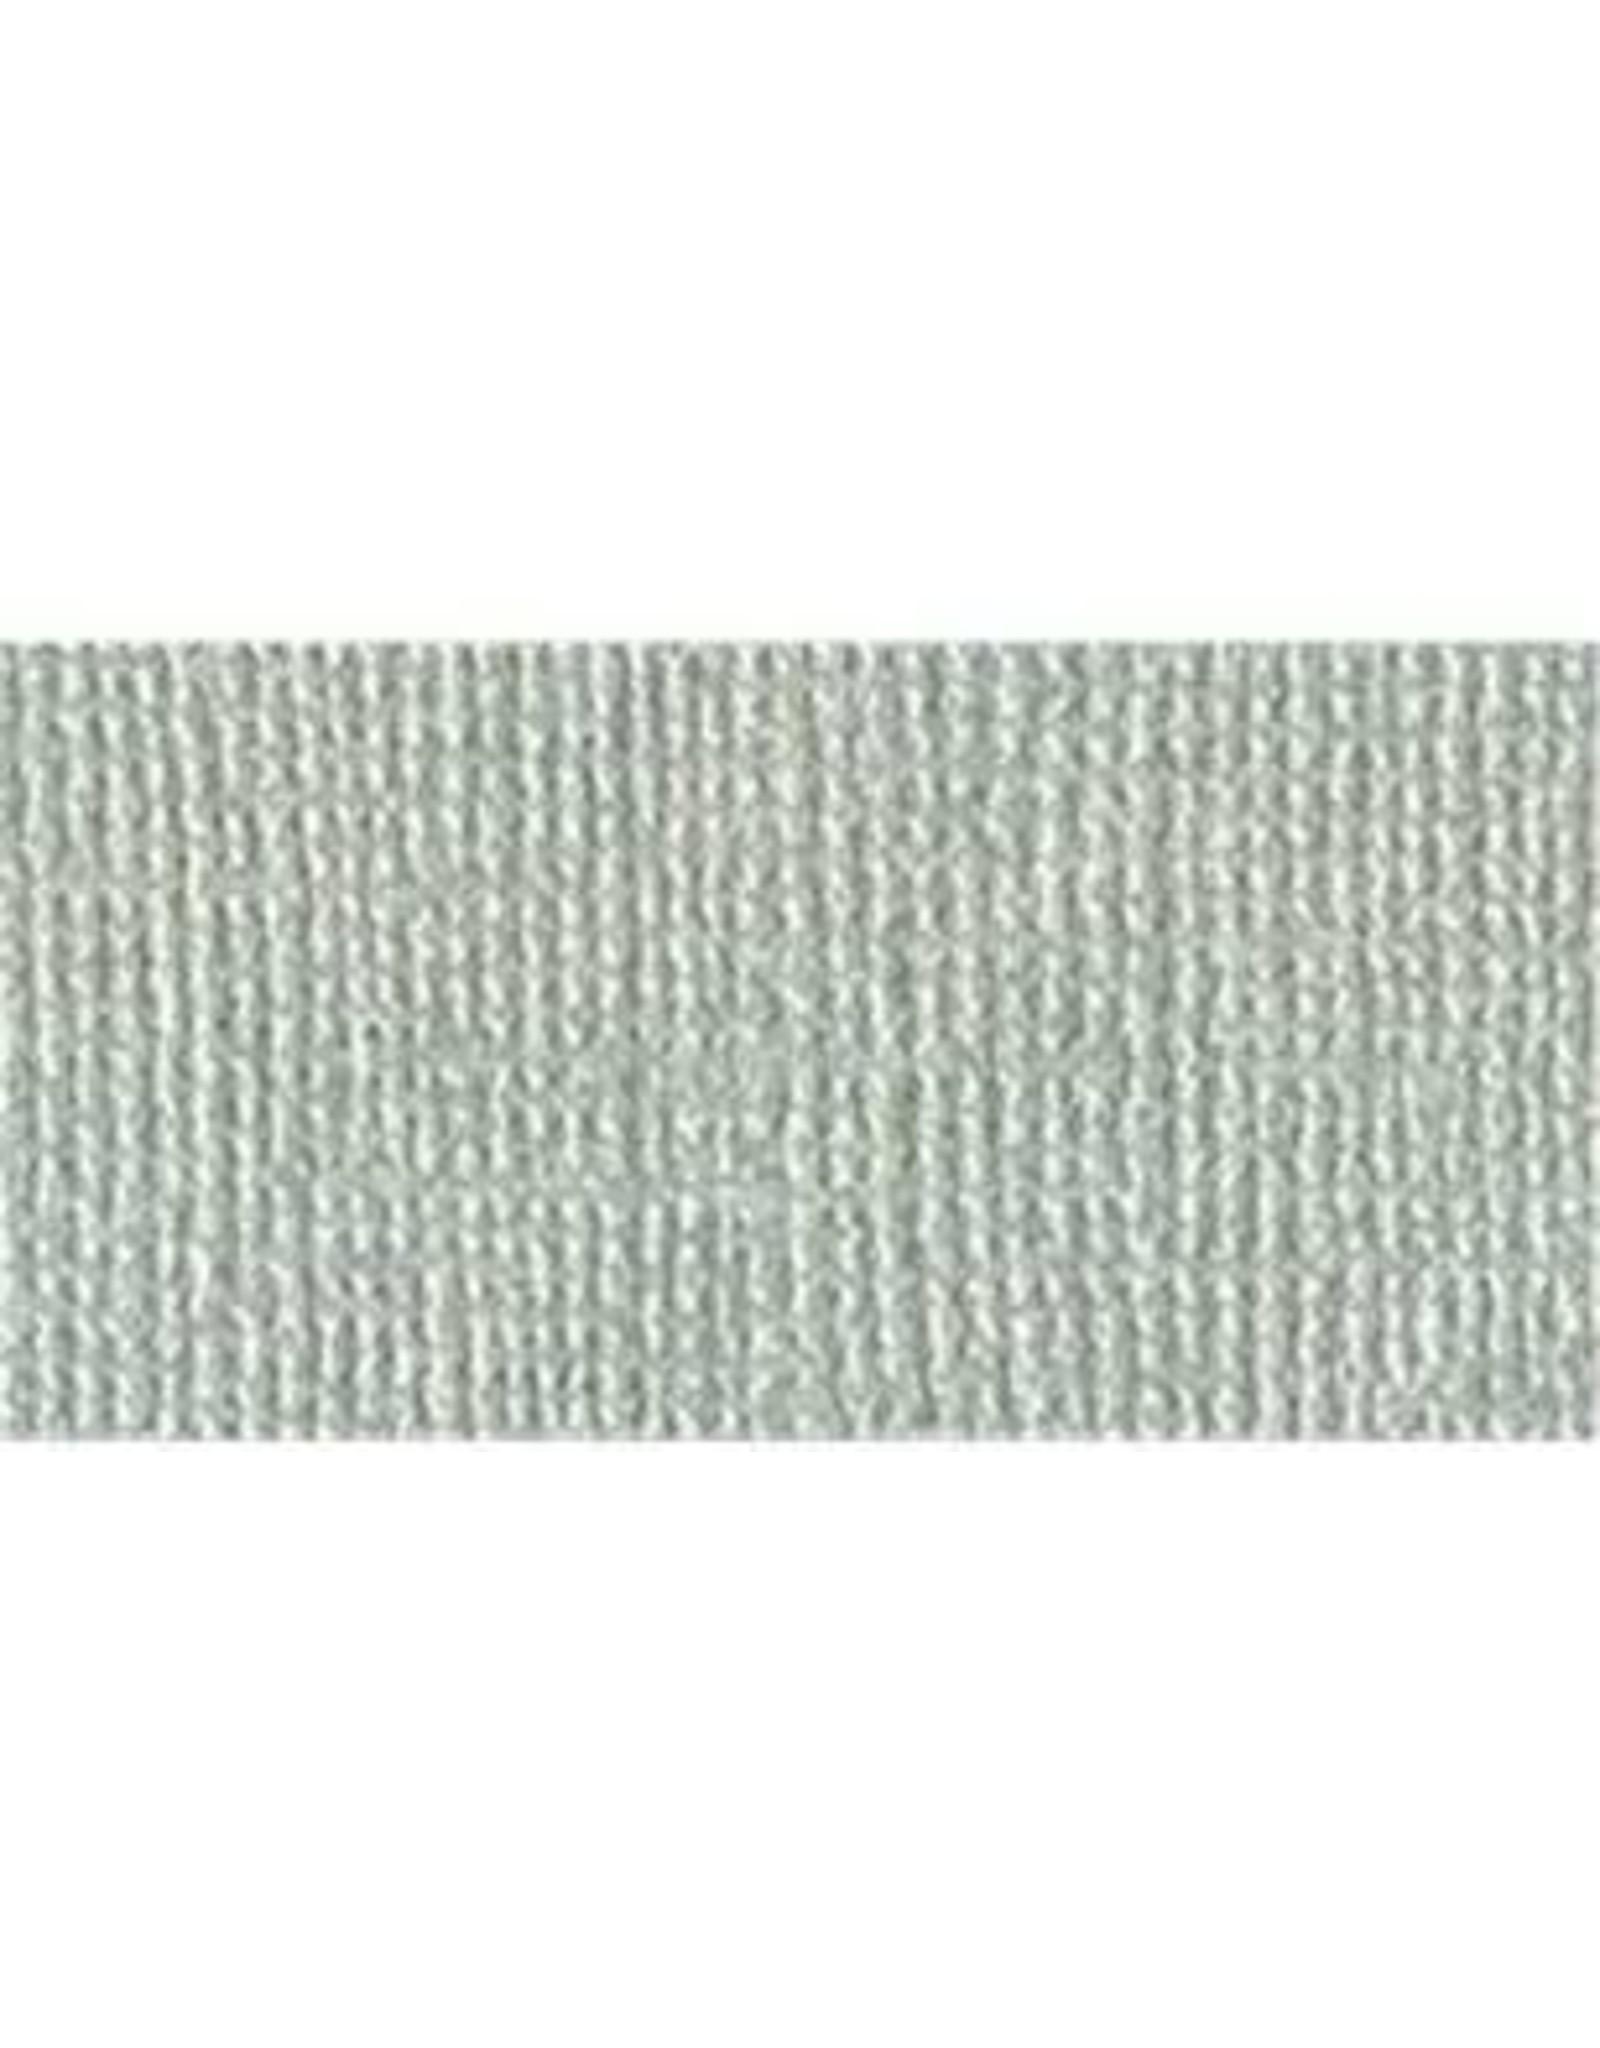 Bazzill Bazzill Bling Cardstock-Tungsten